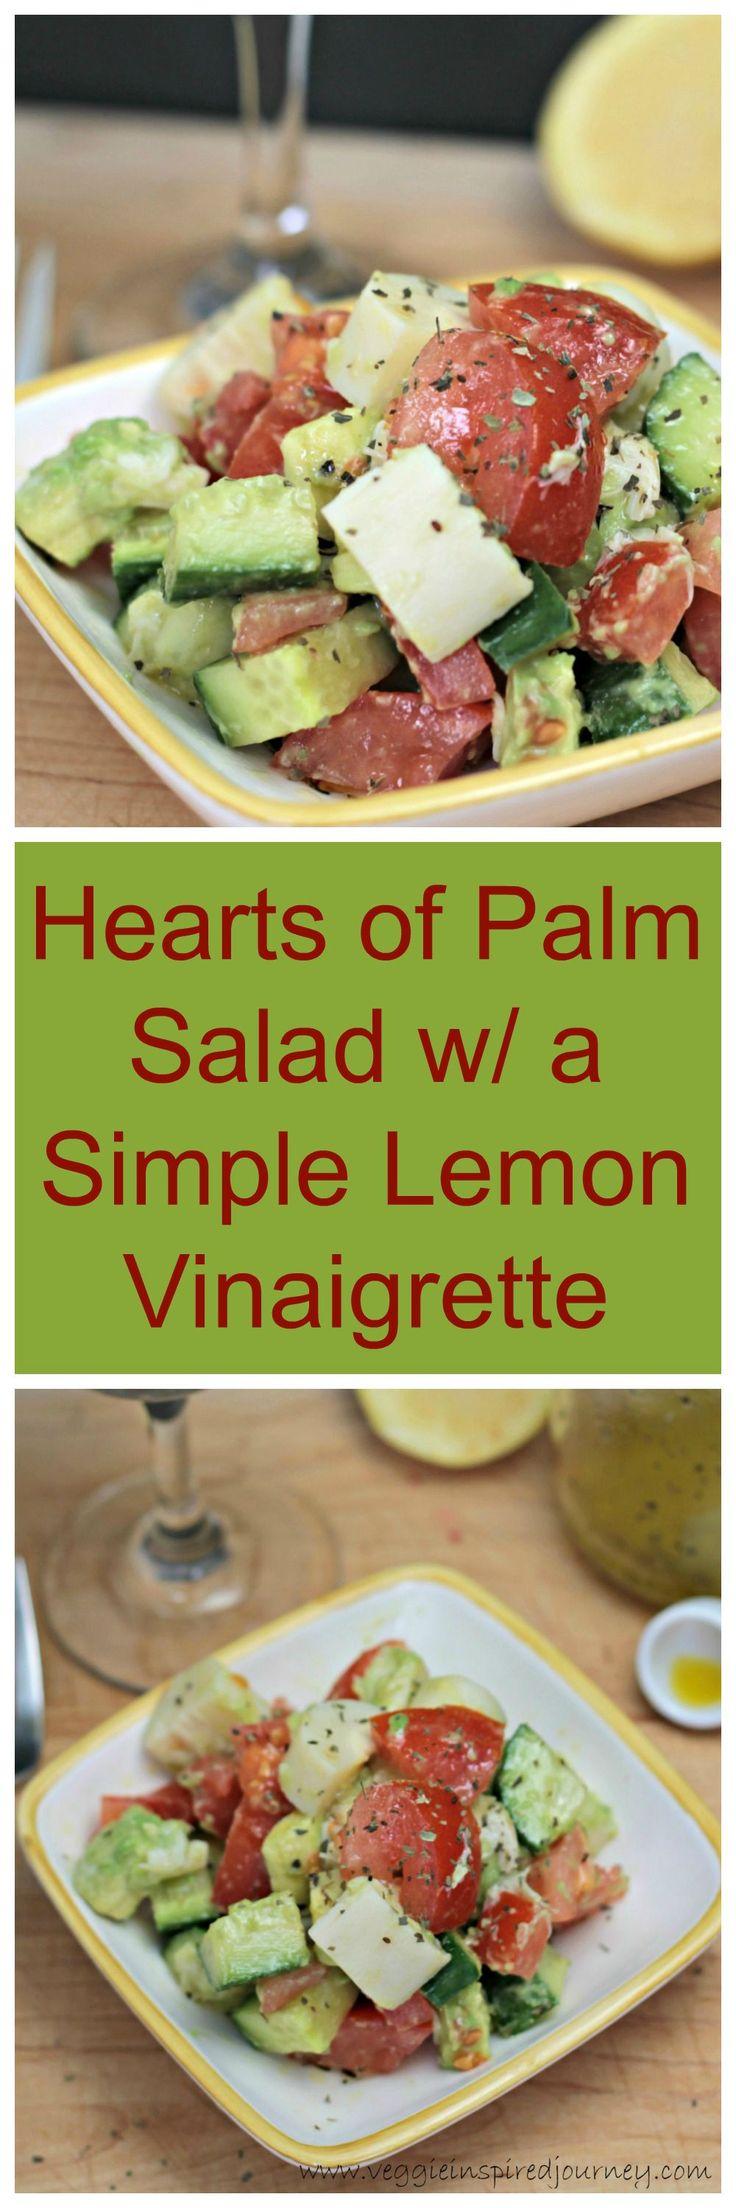 Hearts of Palm Salad w/ a Simple Lemon Vinaigrette